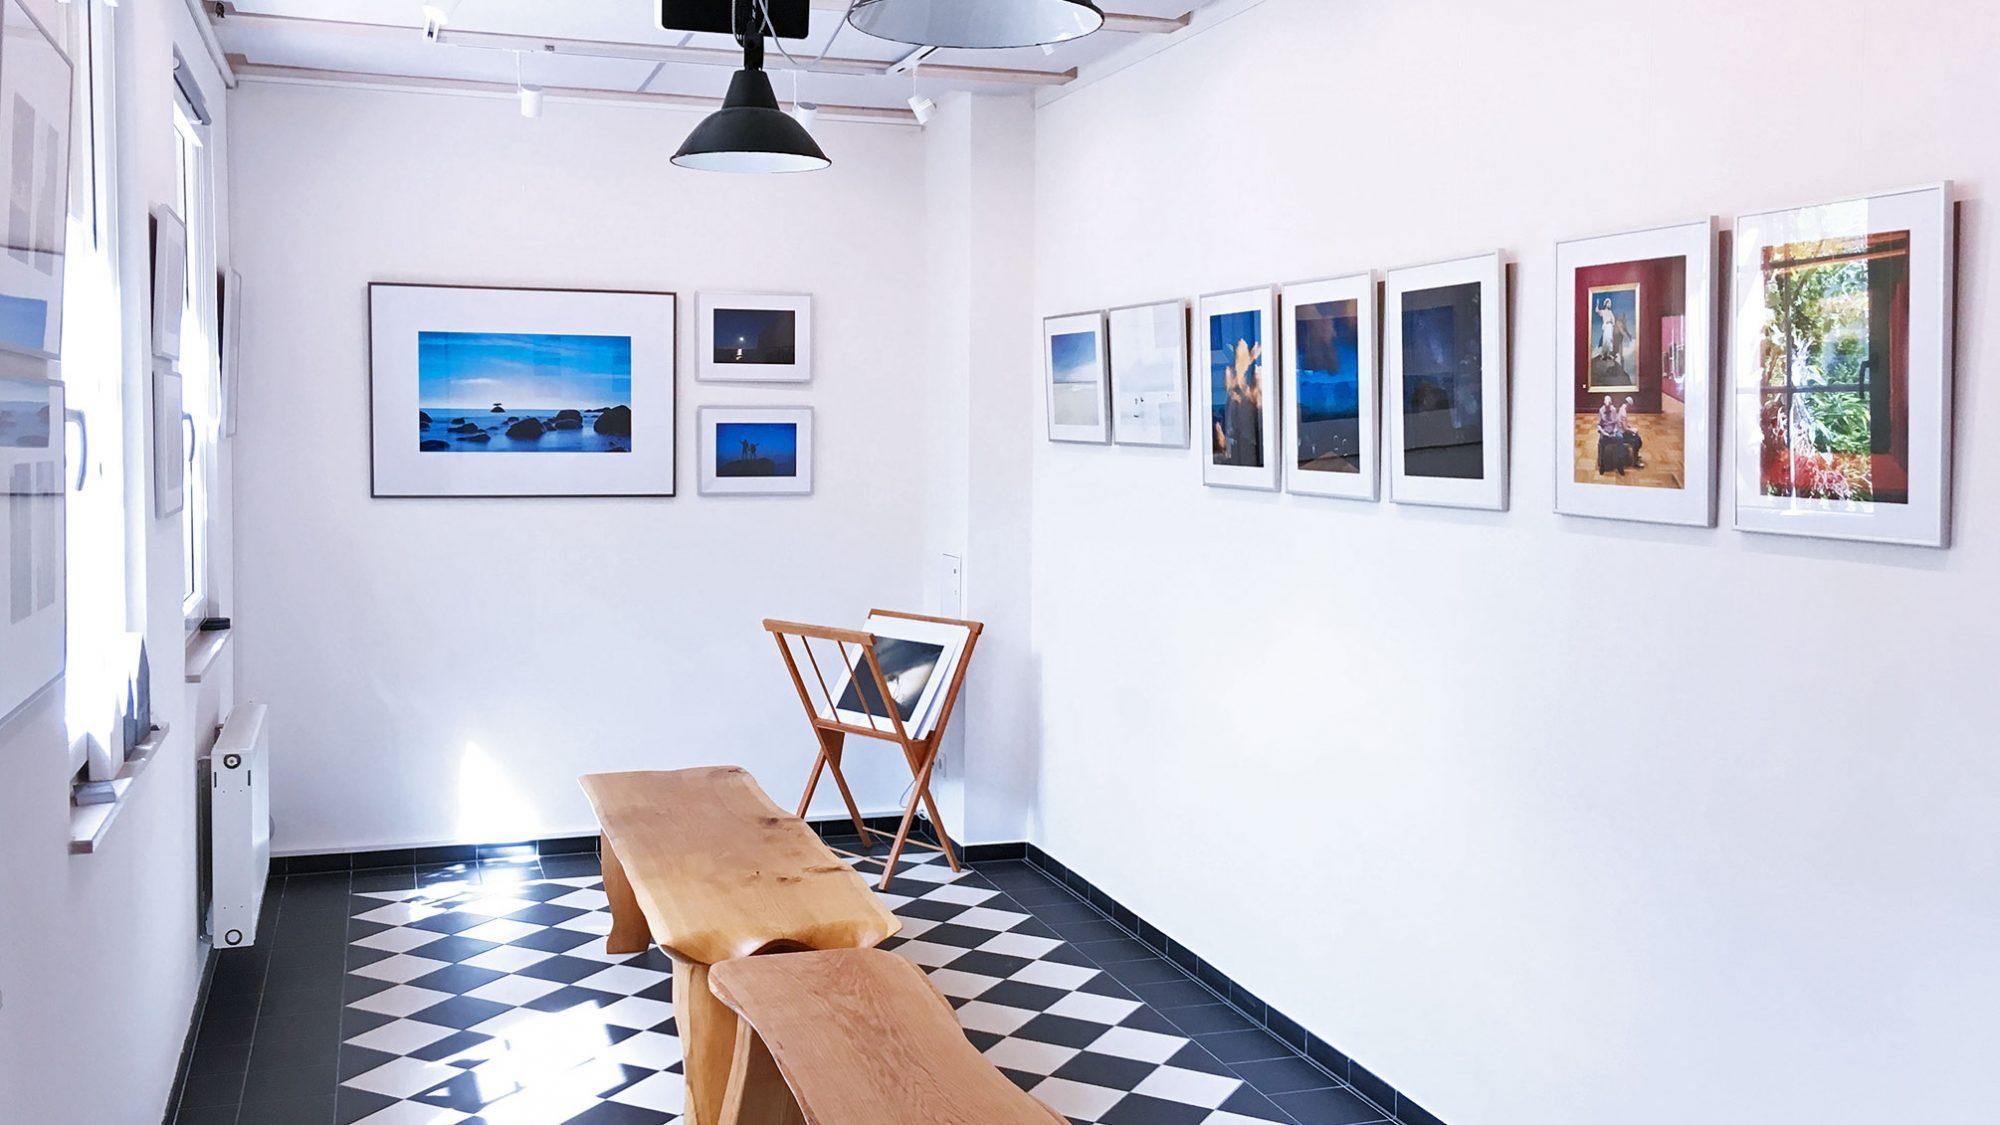 Bleu Blau Blue - Galerie Remise 56 Strausberg bei Berlin